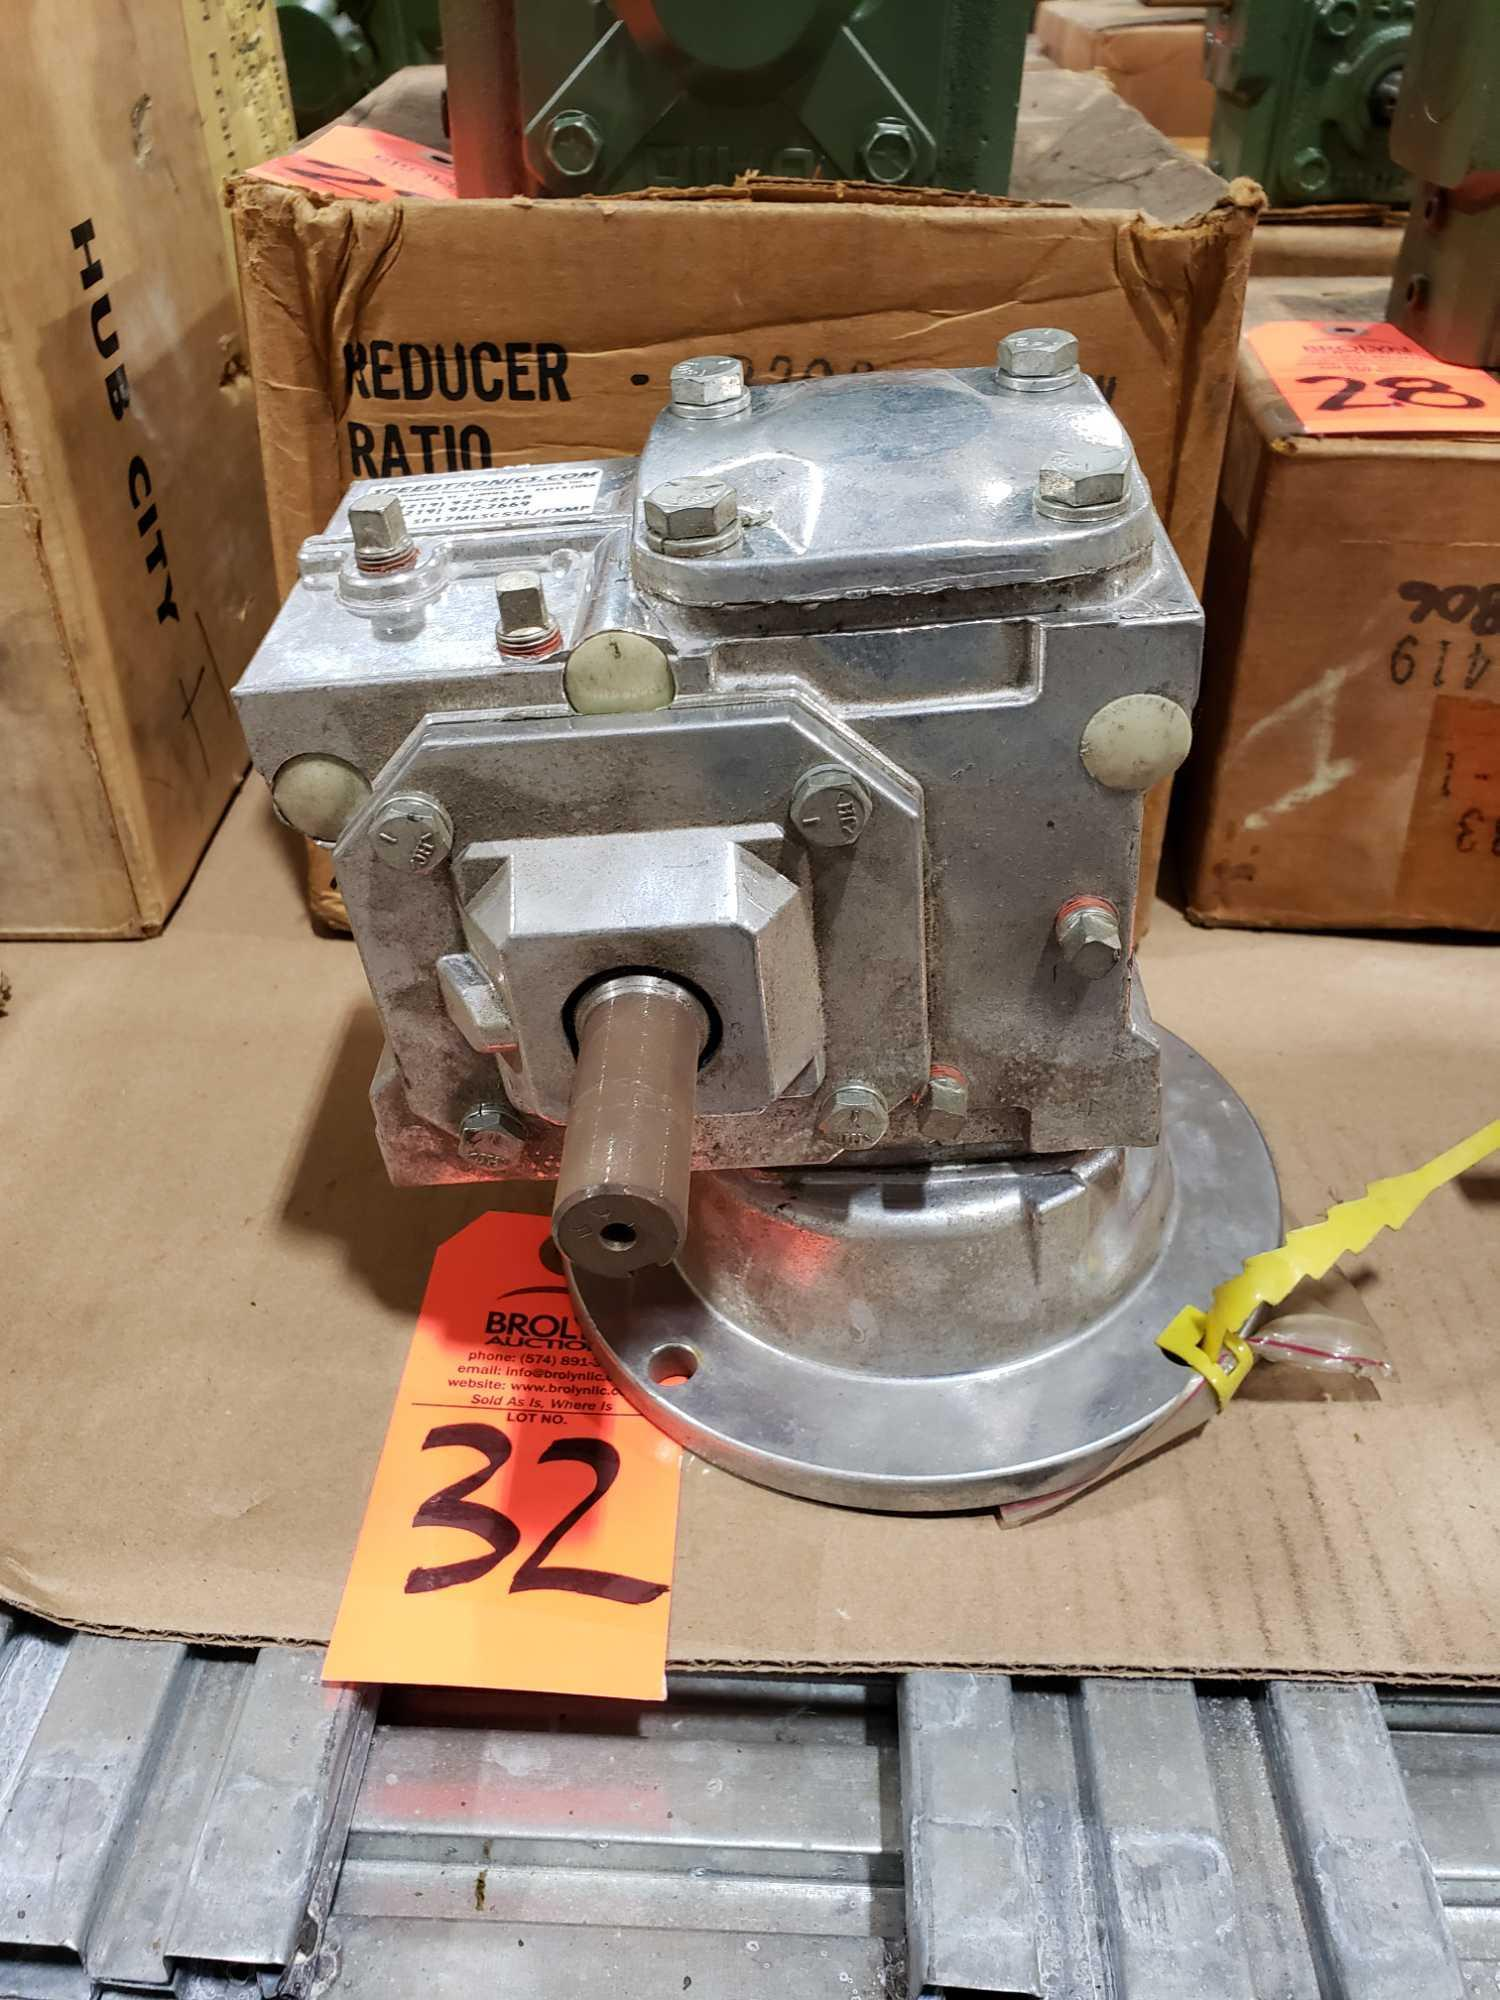 Lot 32 - Speedtronics Gear box model SP17MLSC55L/FXMP. Ratio 5. New without box. Minor shelf wear.